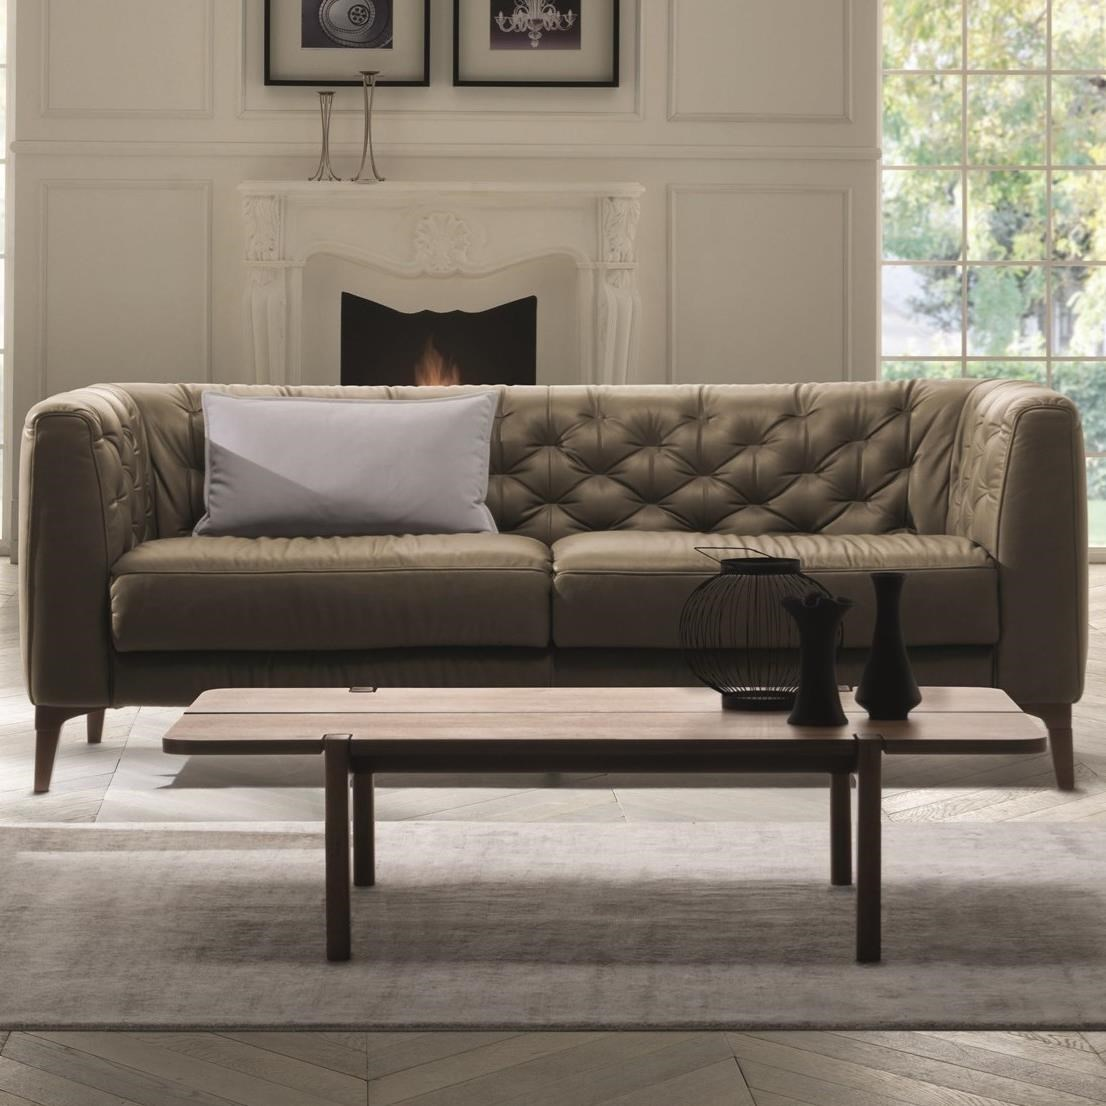 natuzzi sectional sofa connectors chair and ottoman editions rodolfo b988 009 mid century modern